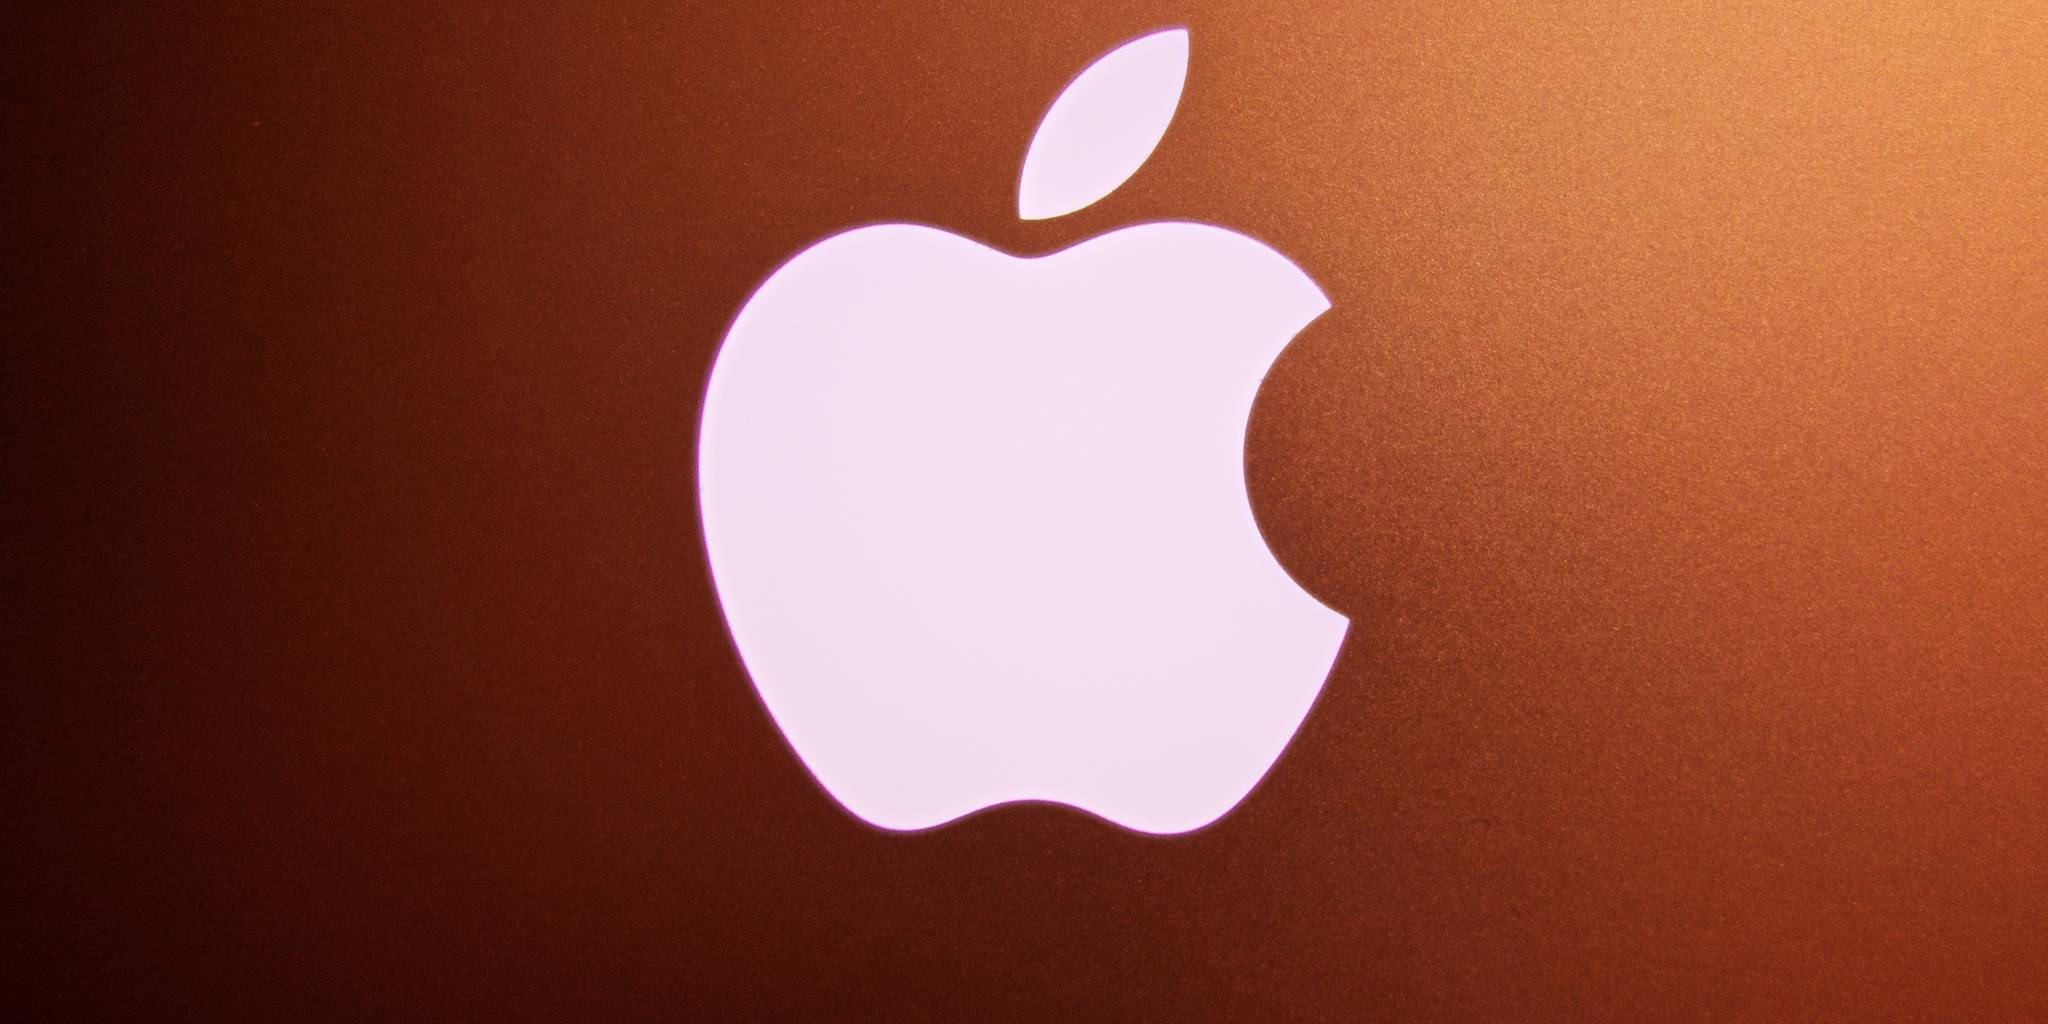 Apple Inc. clipart apple iphone #13